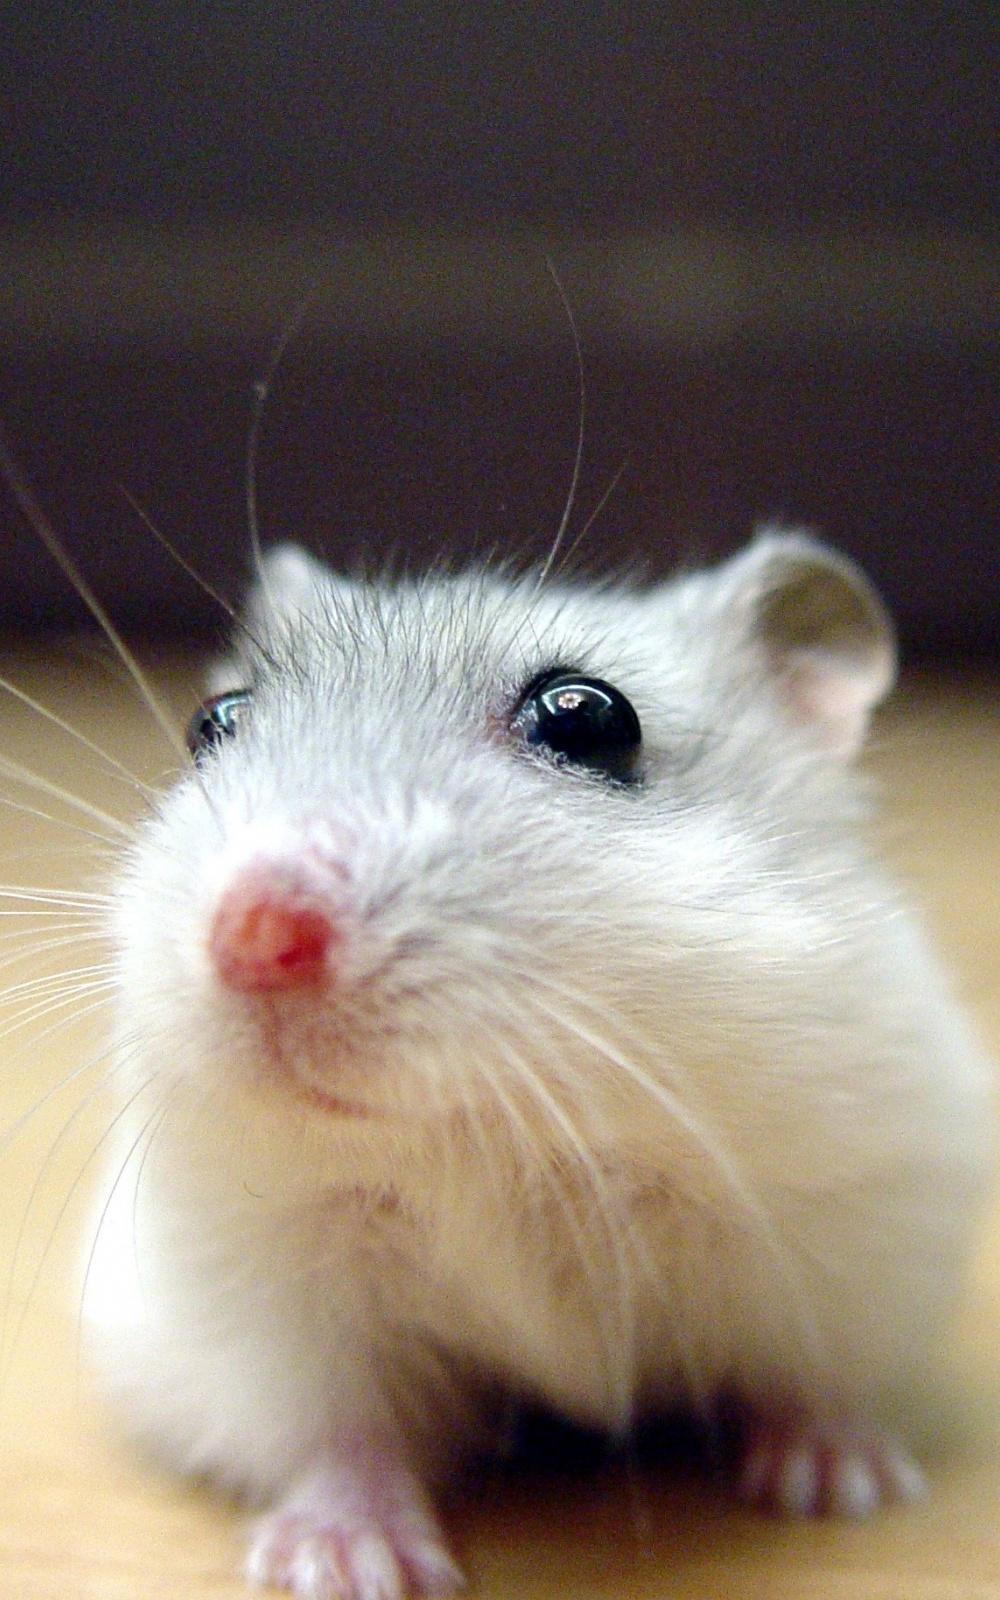 Black Eyed White Mouse iPhone 6 Plus HD Wallpaper iPod Wallpaper HD 1000x1600